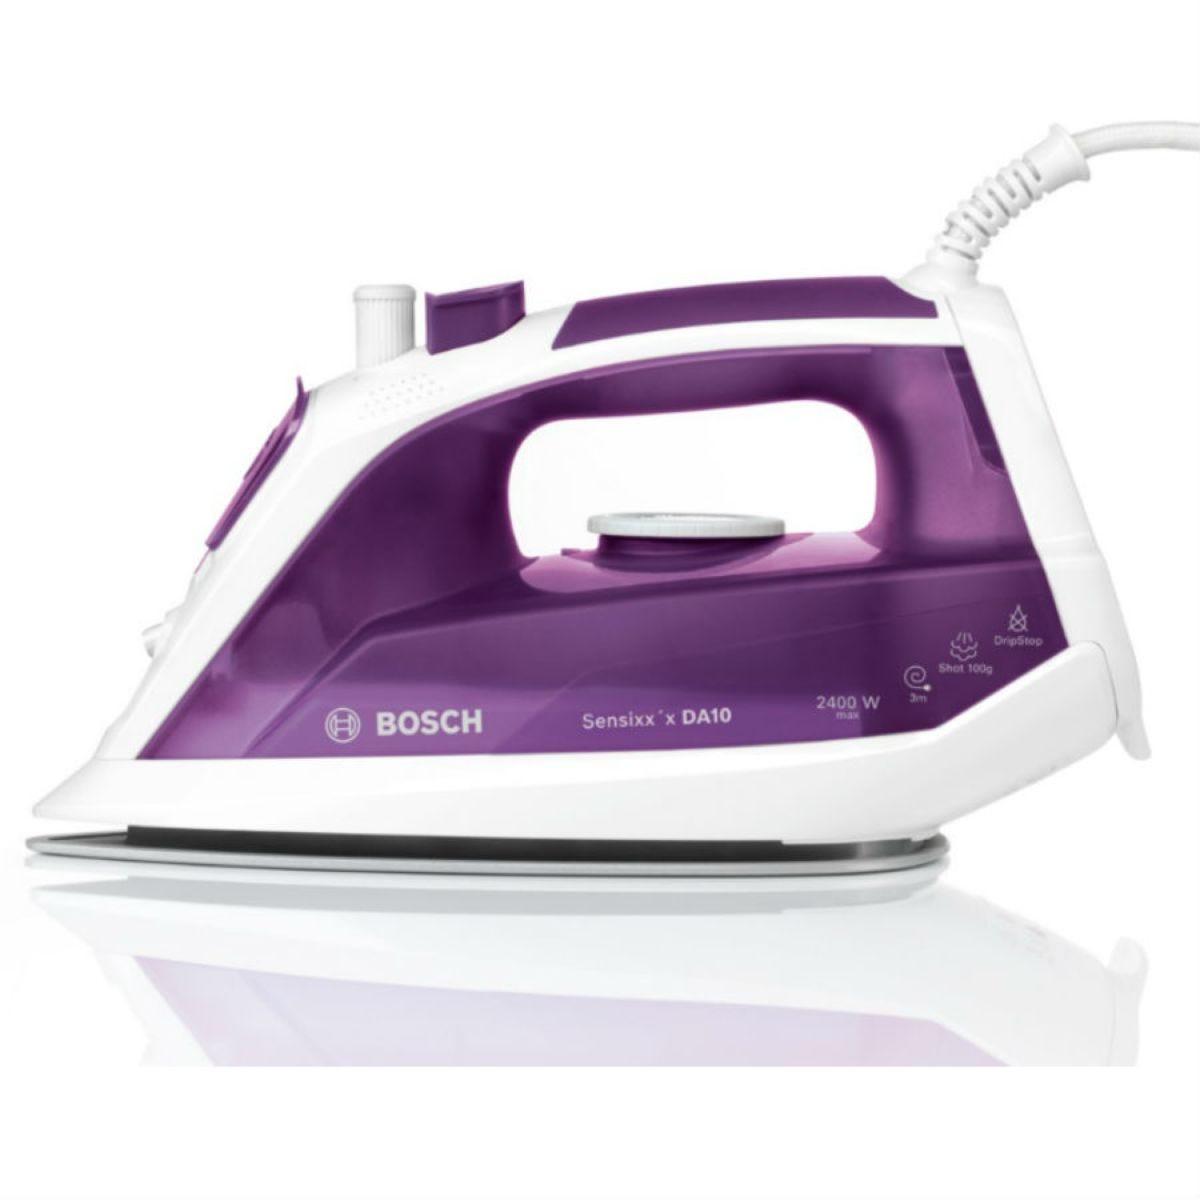 Bosch TDA1060GB Sensixx'x DA10 2400W Steam Iron – Purple